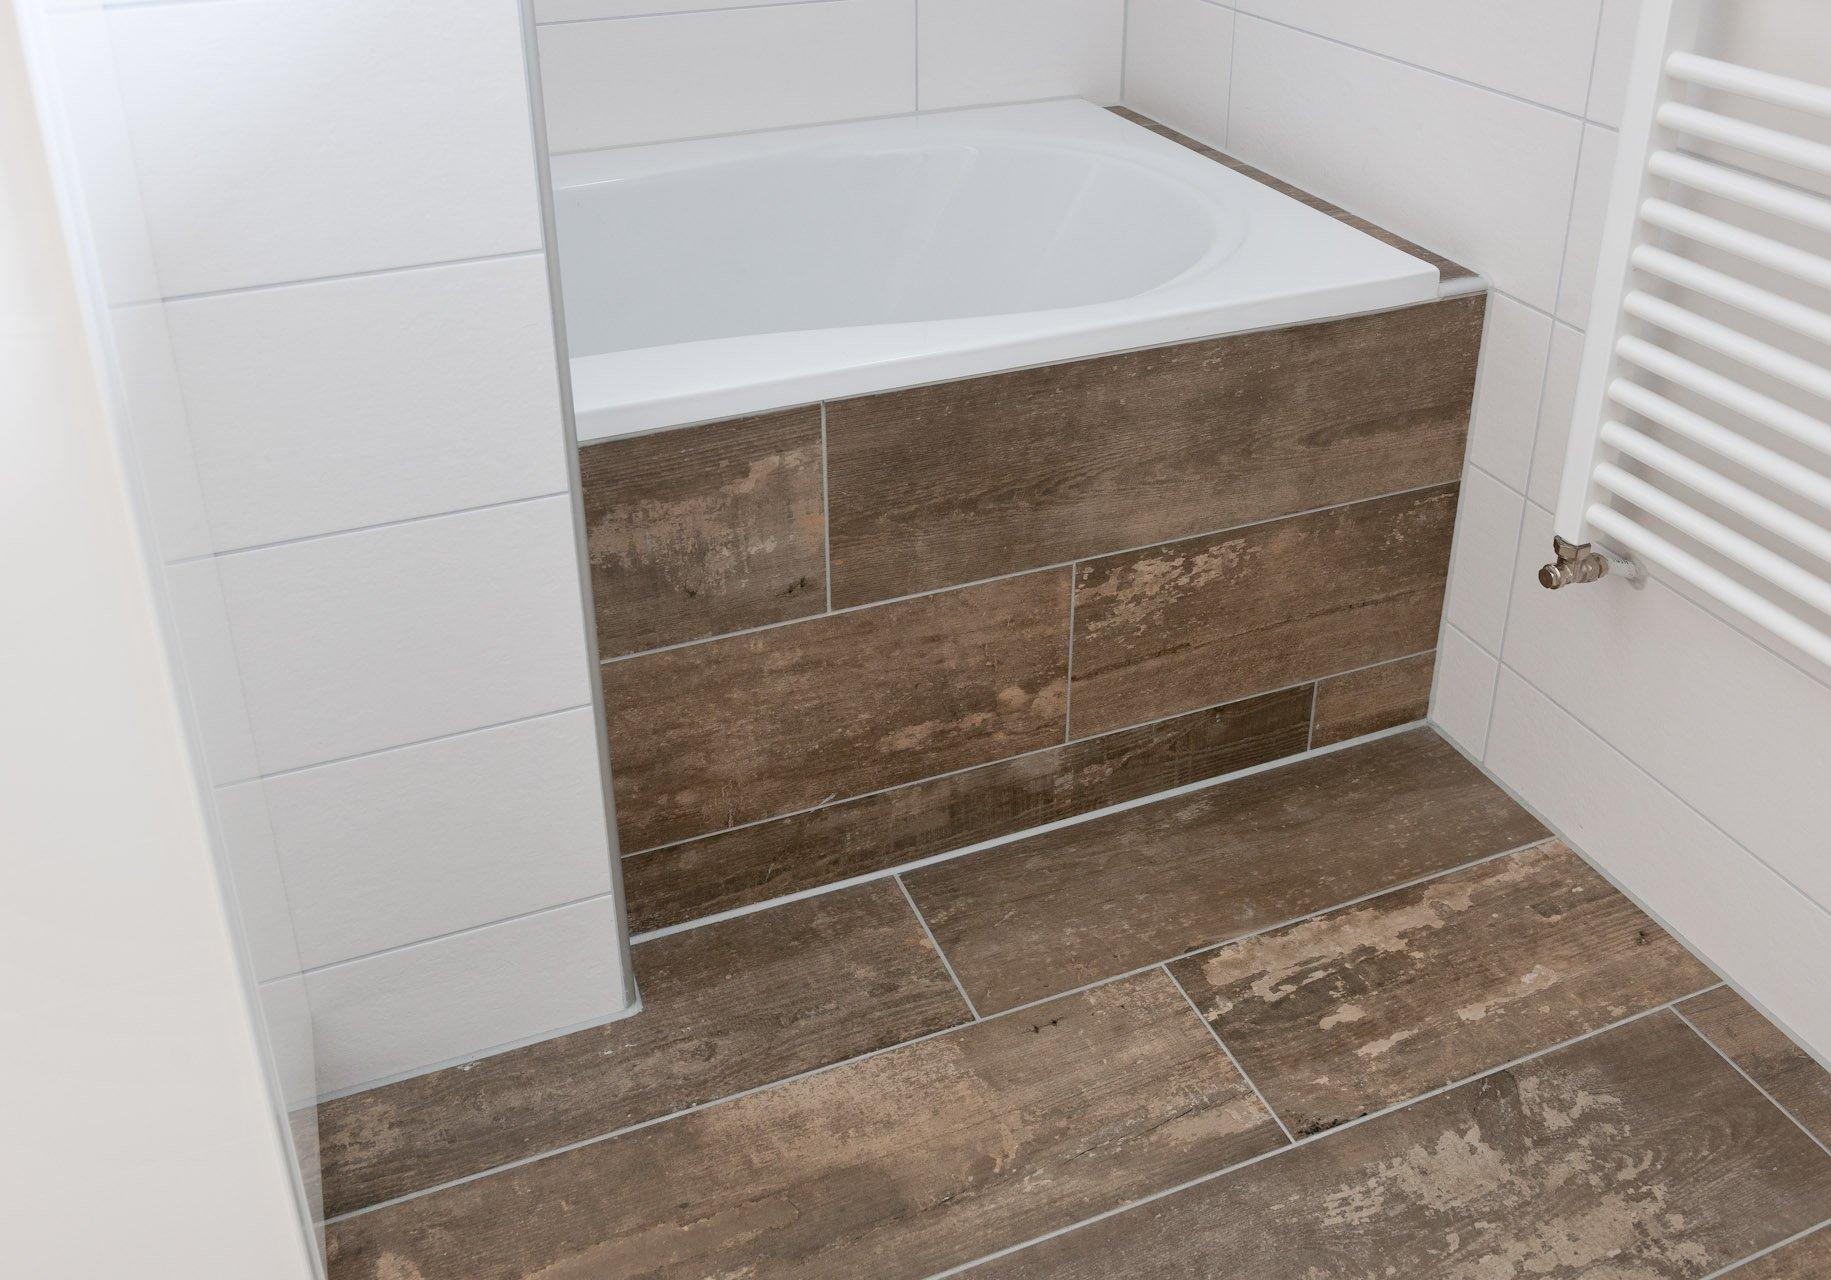 20170325&132408_Leisteen Vloer Badkamer ~ Wandtegels badkamer  KROON vloer in Steen